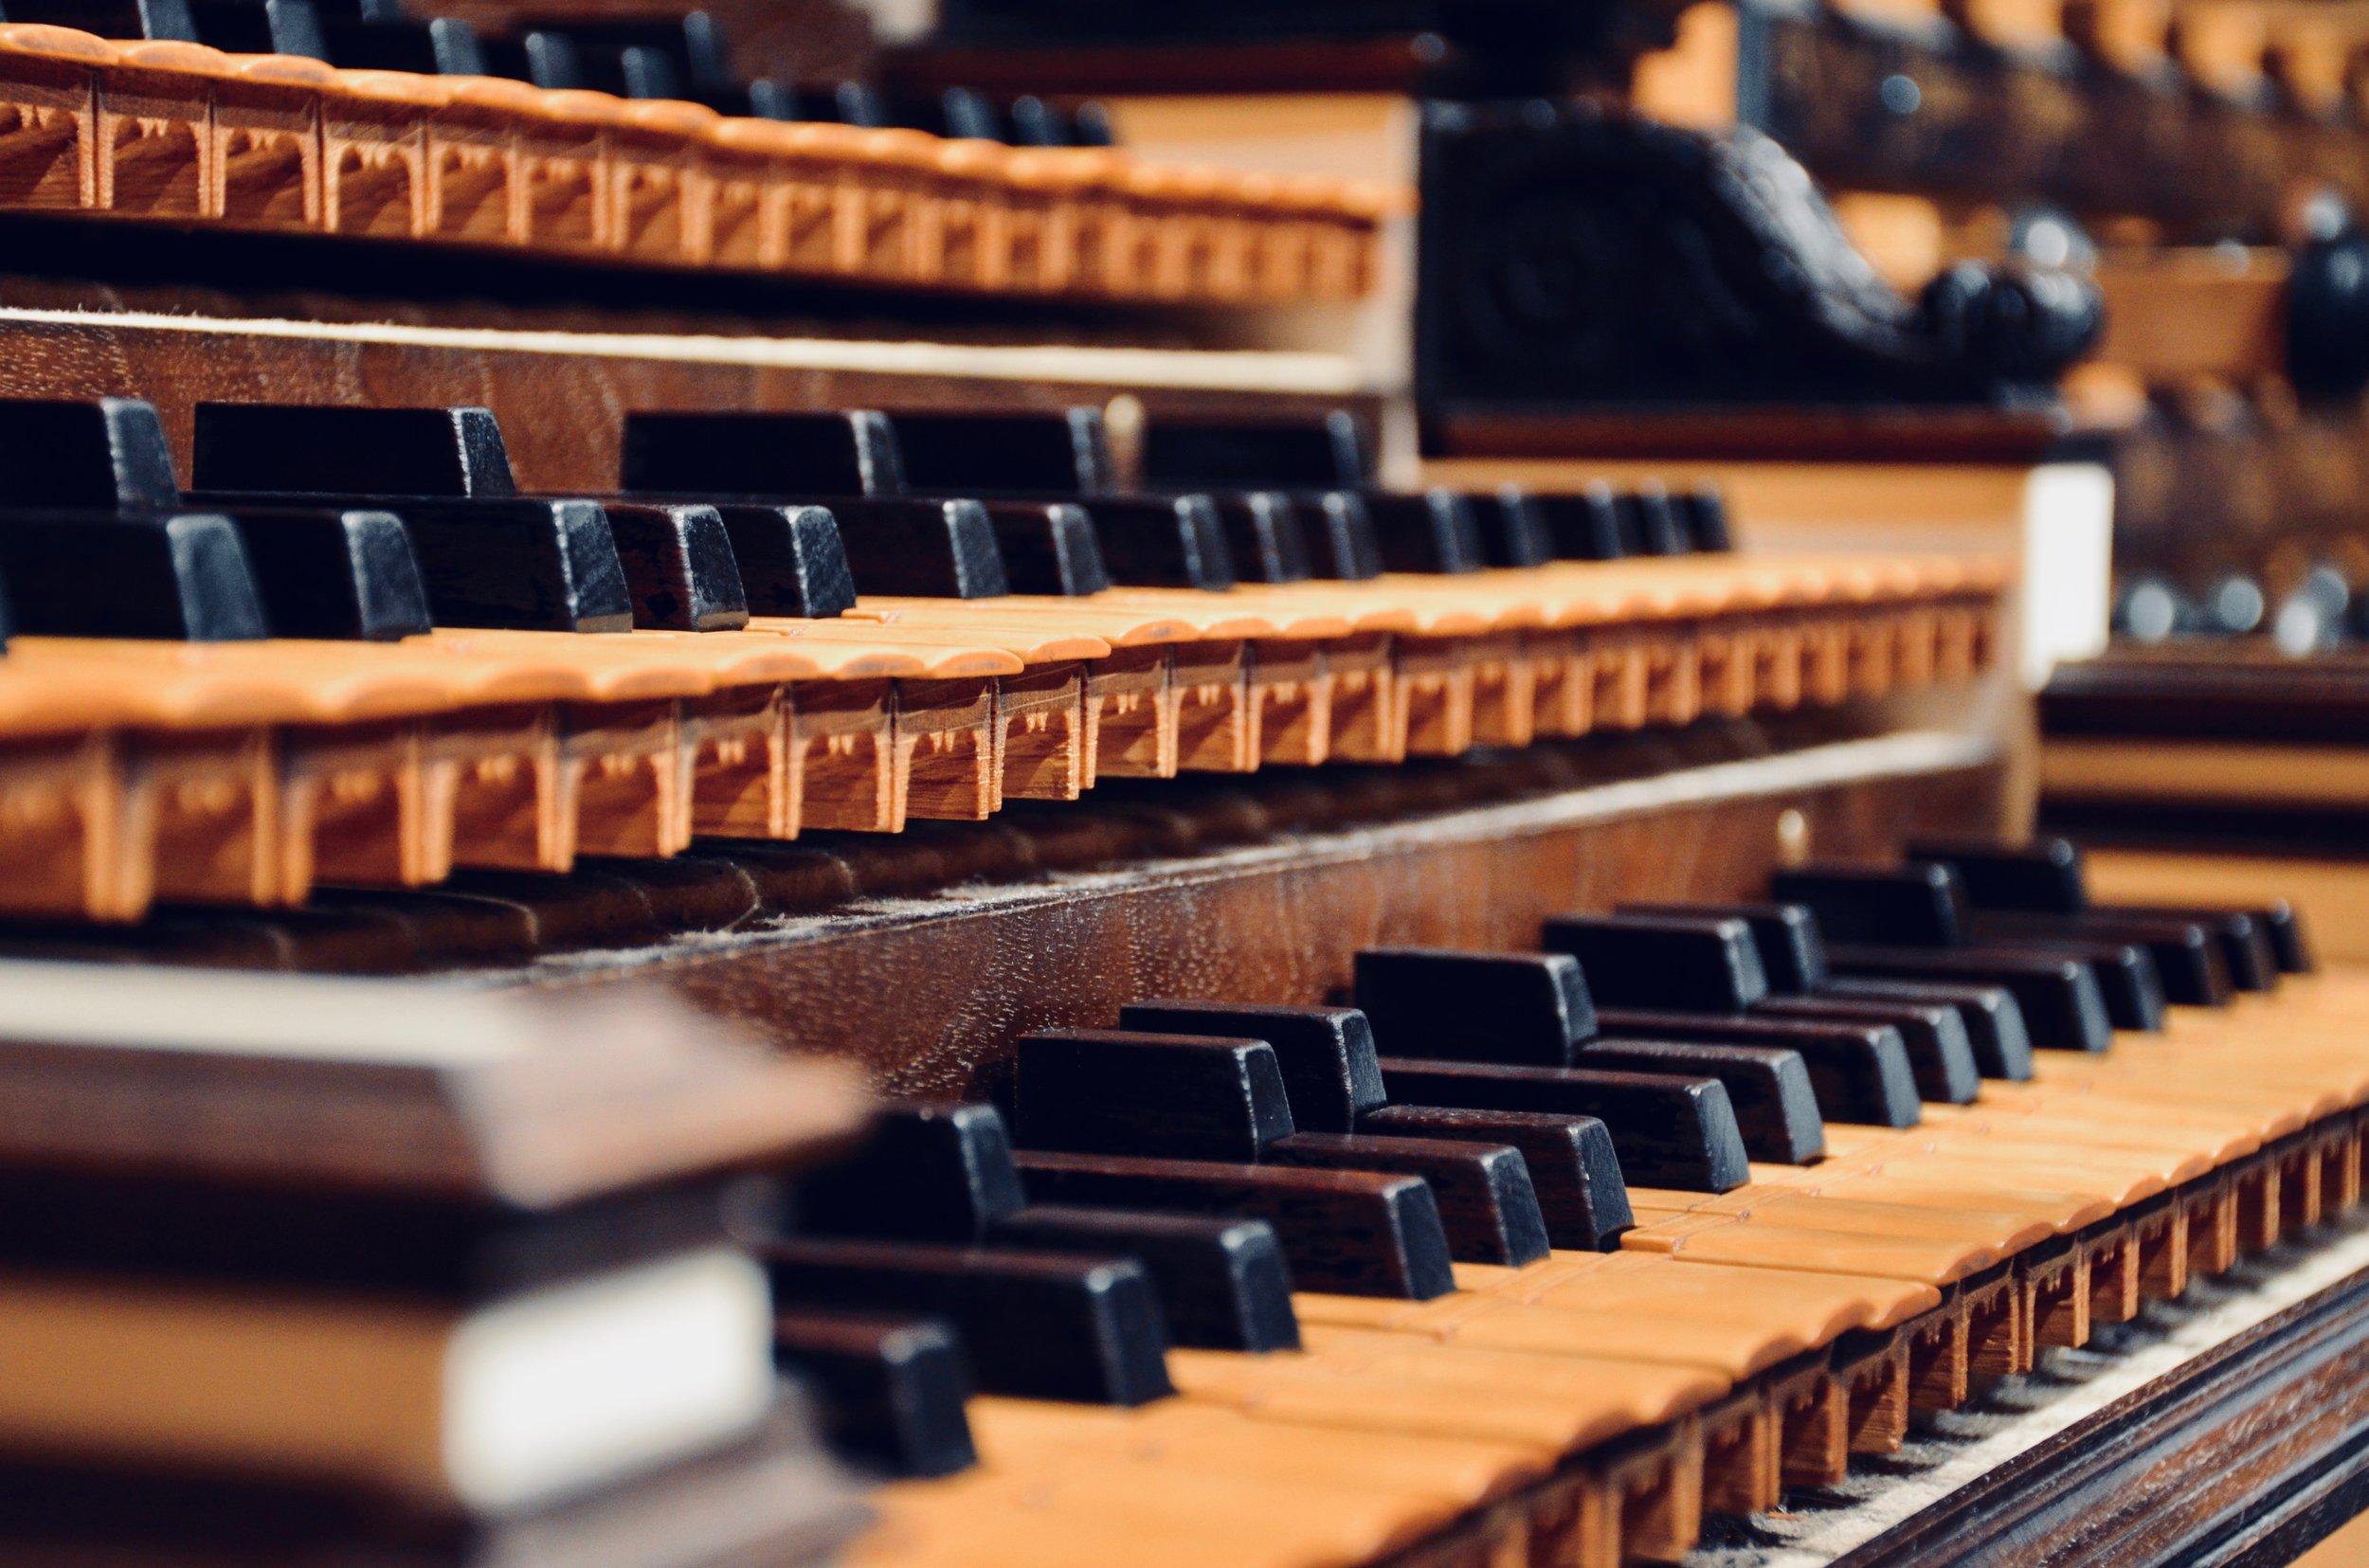 Keydesk detail, 2000 GoART North German Baroque Research Organ in Örgryte New Church, Göteborg, Sweden.